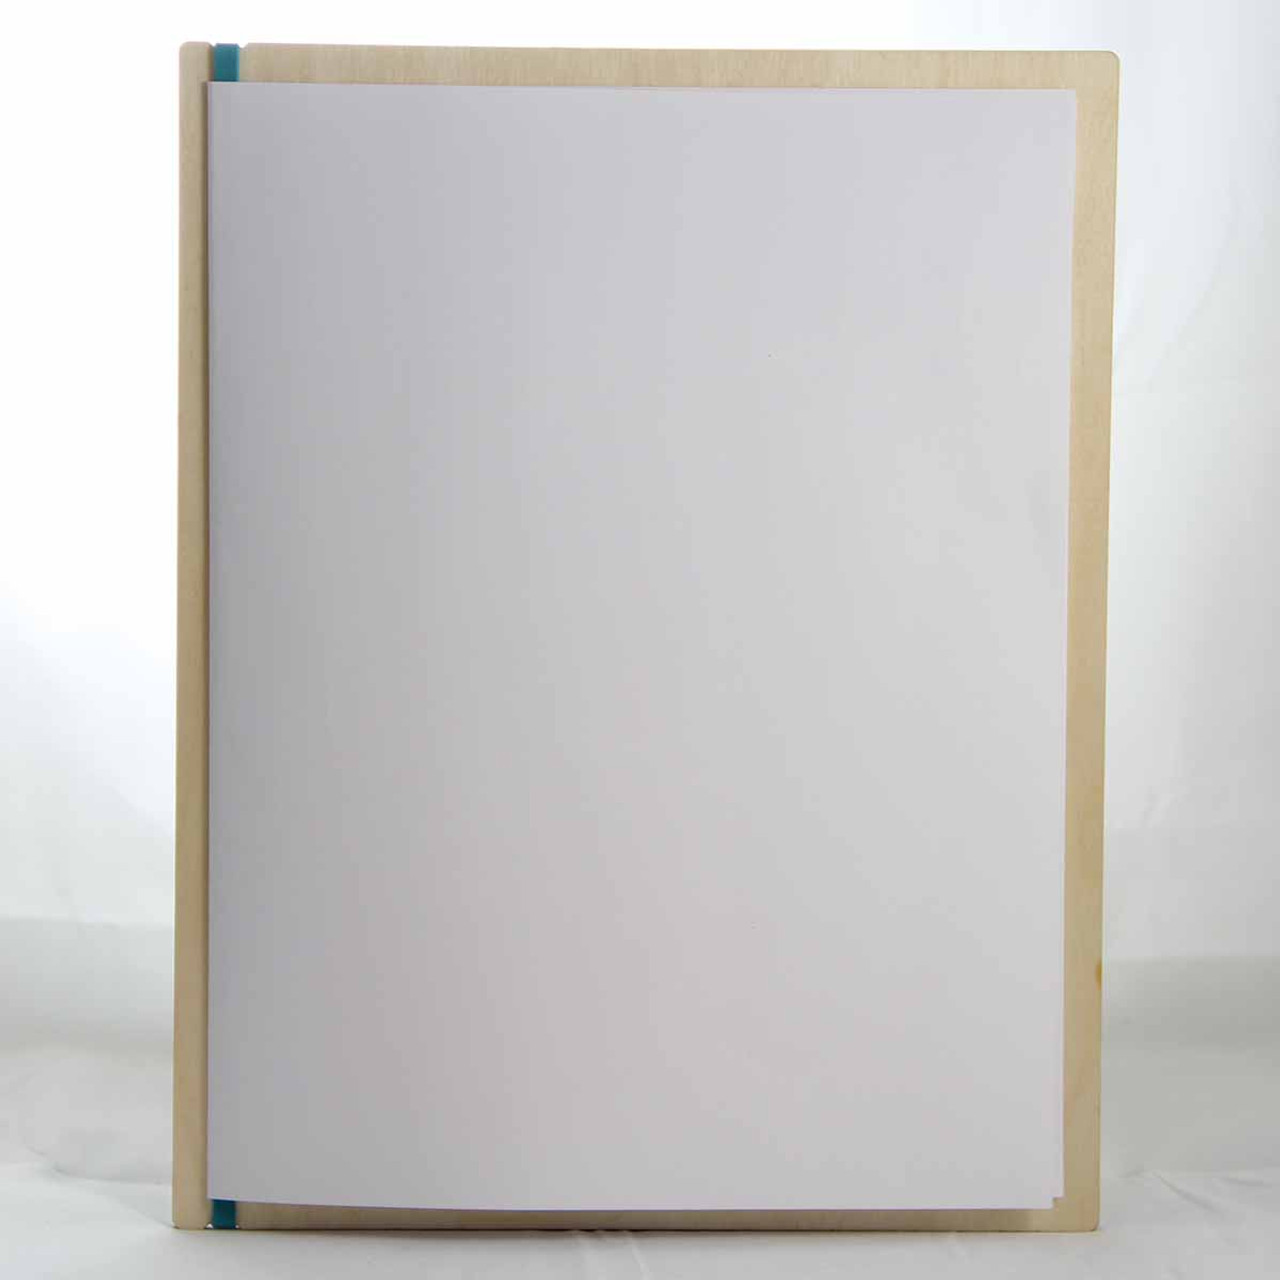 Baltic Birch Wood Menu Board with Vertical Band 8.5 x 11